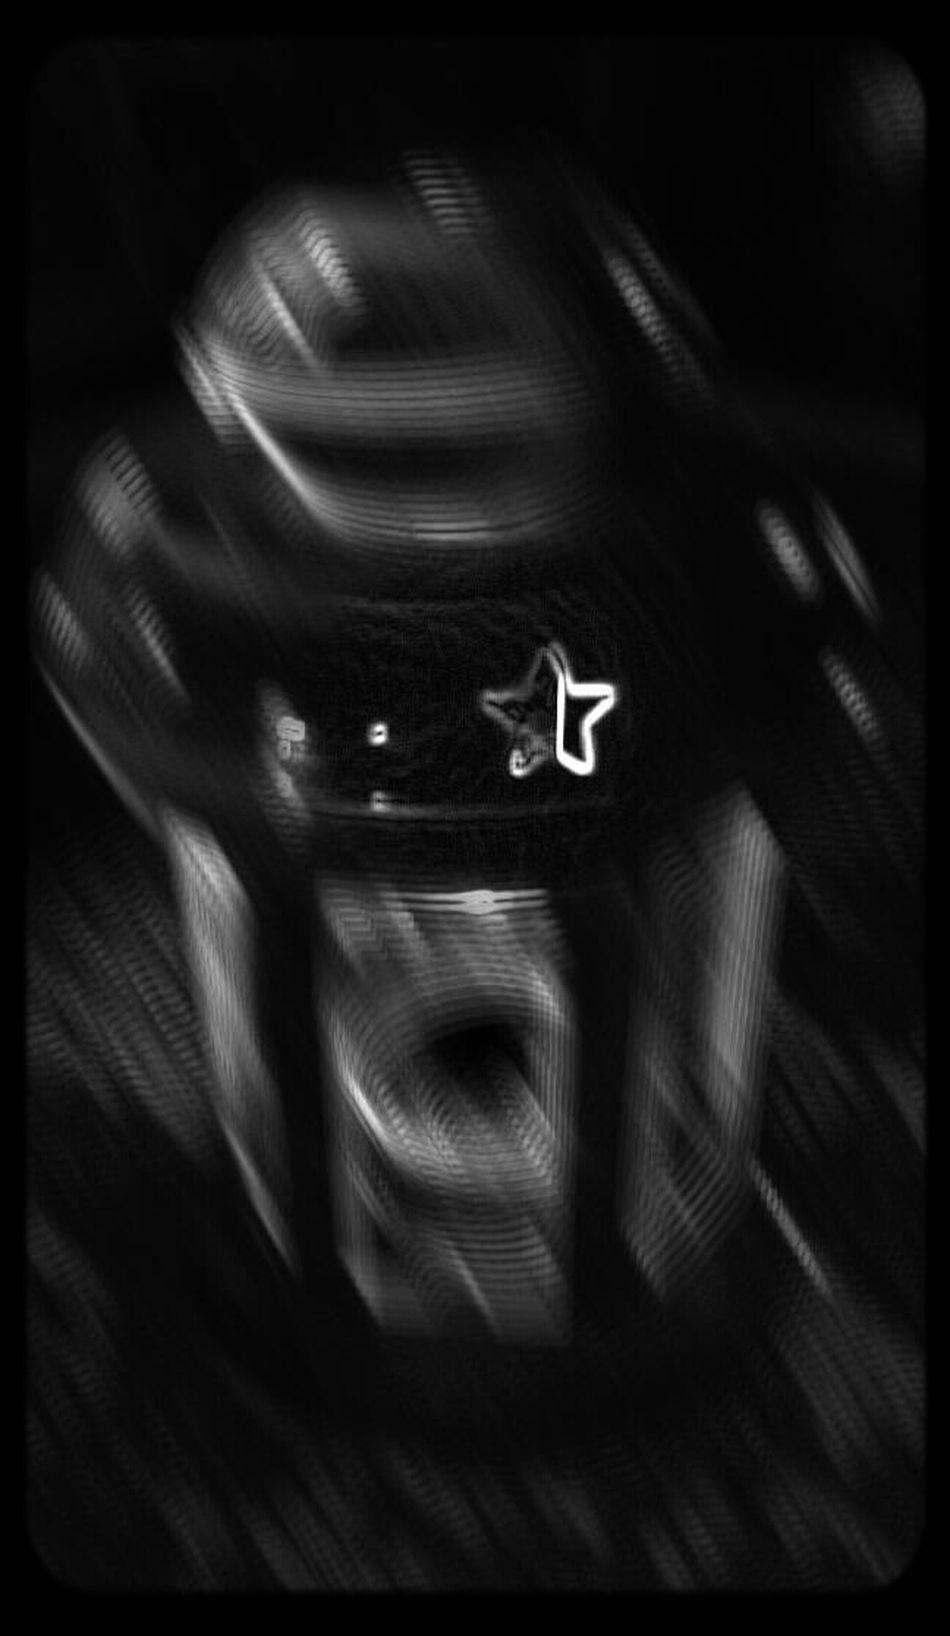 Hello World Dark Light Vivid B/W Photography